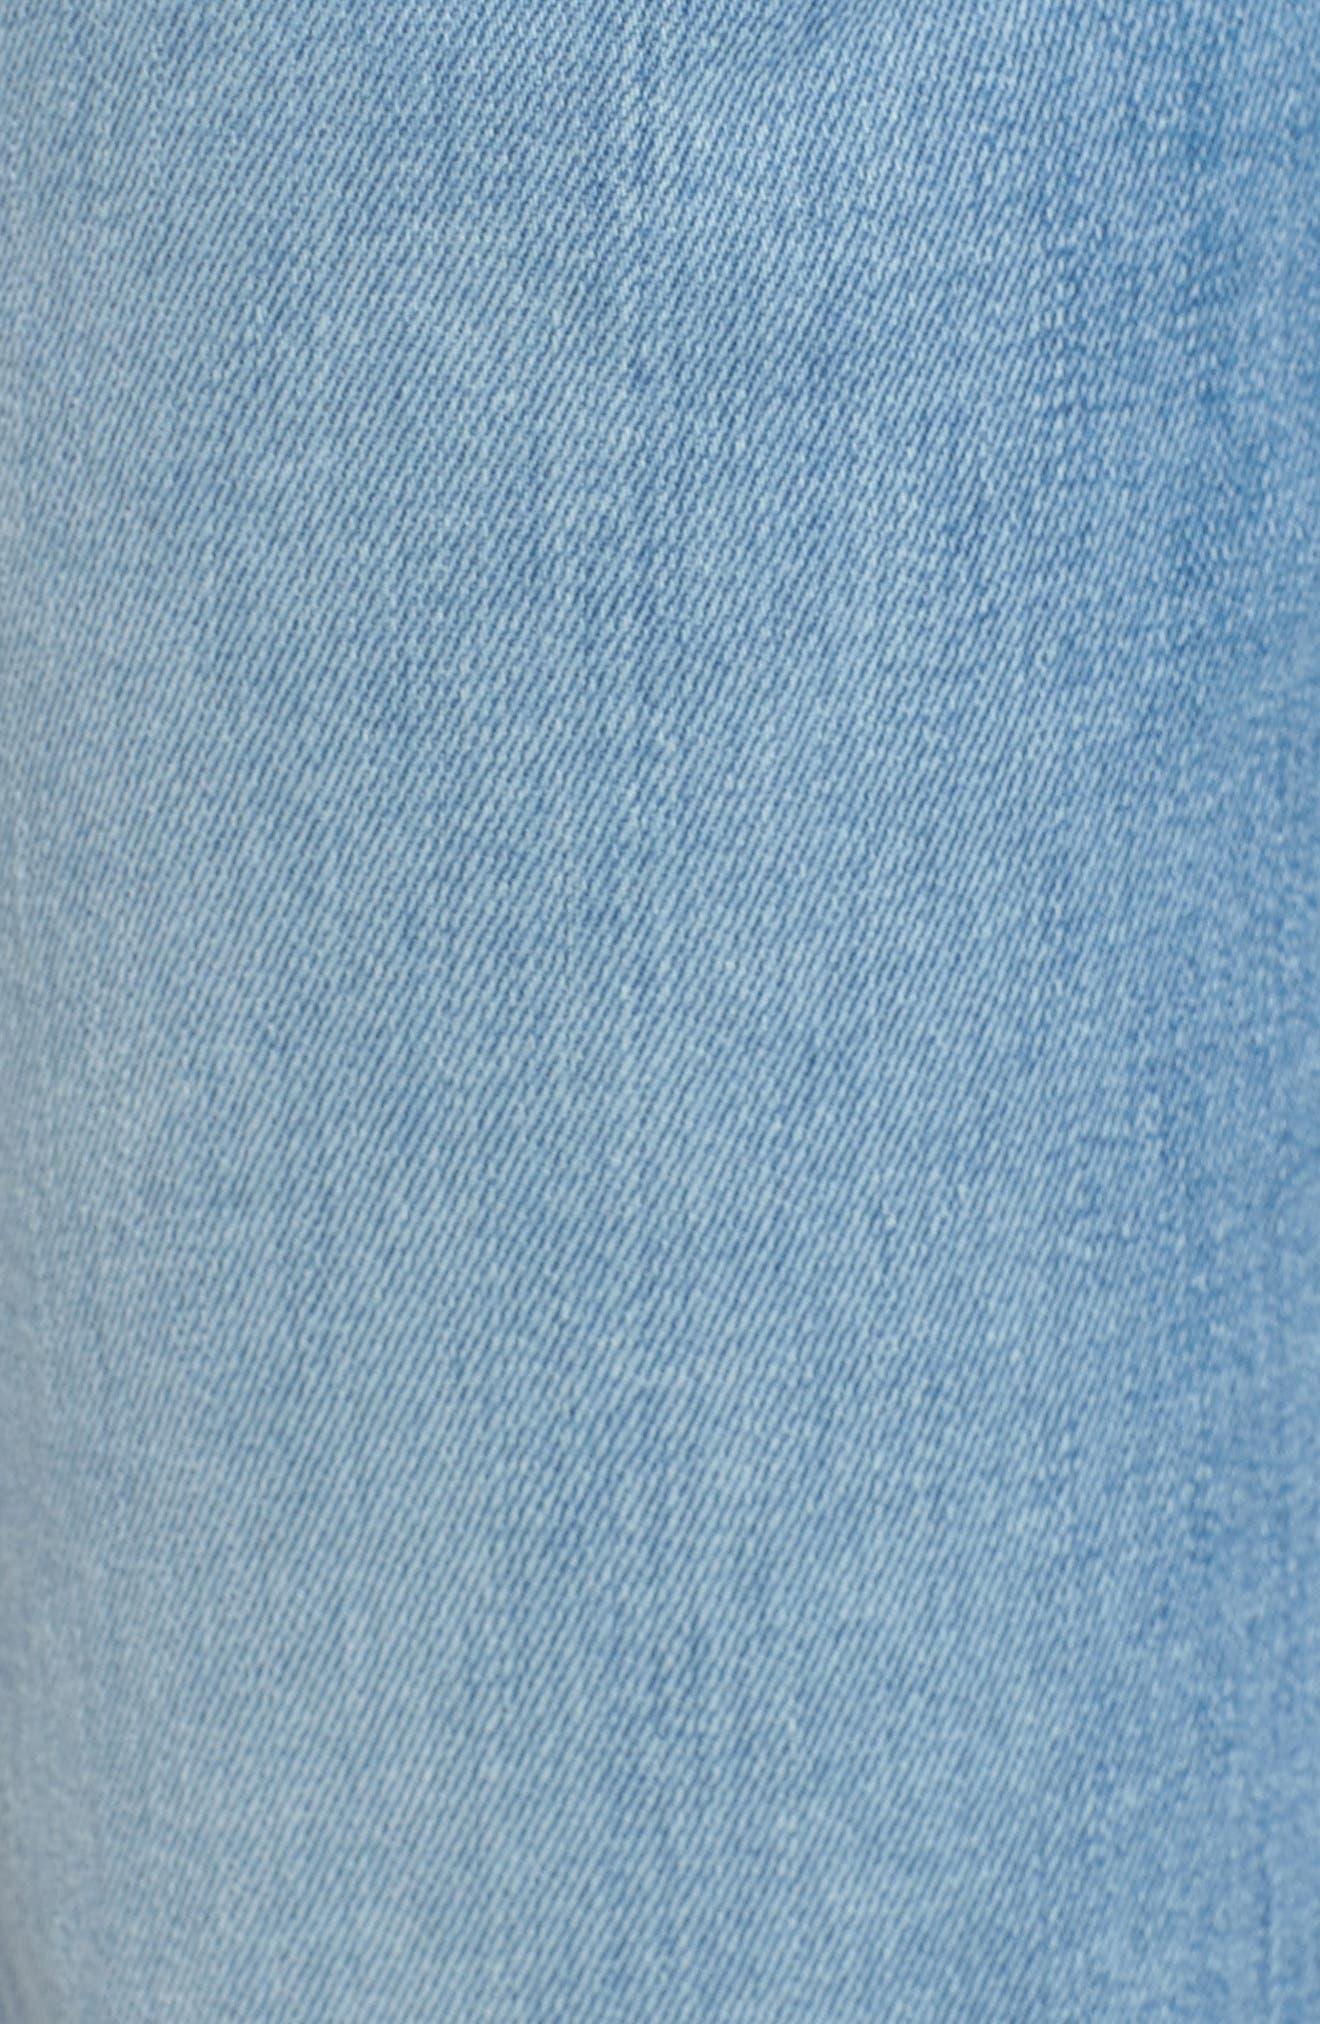 A-Pocket Flare Leg Jeans,                             Alternate thumbnail 6, color,                             401